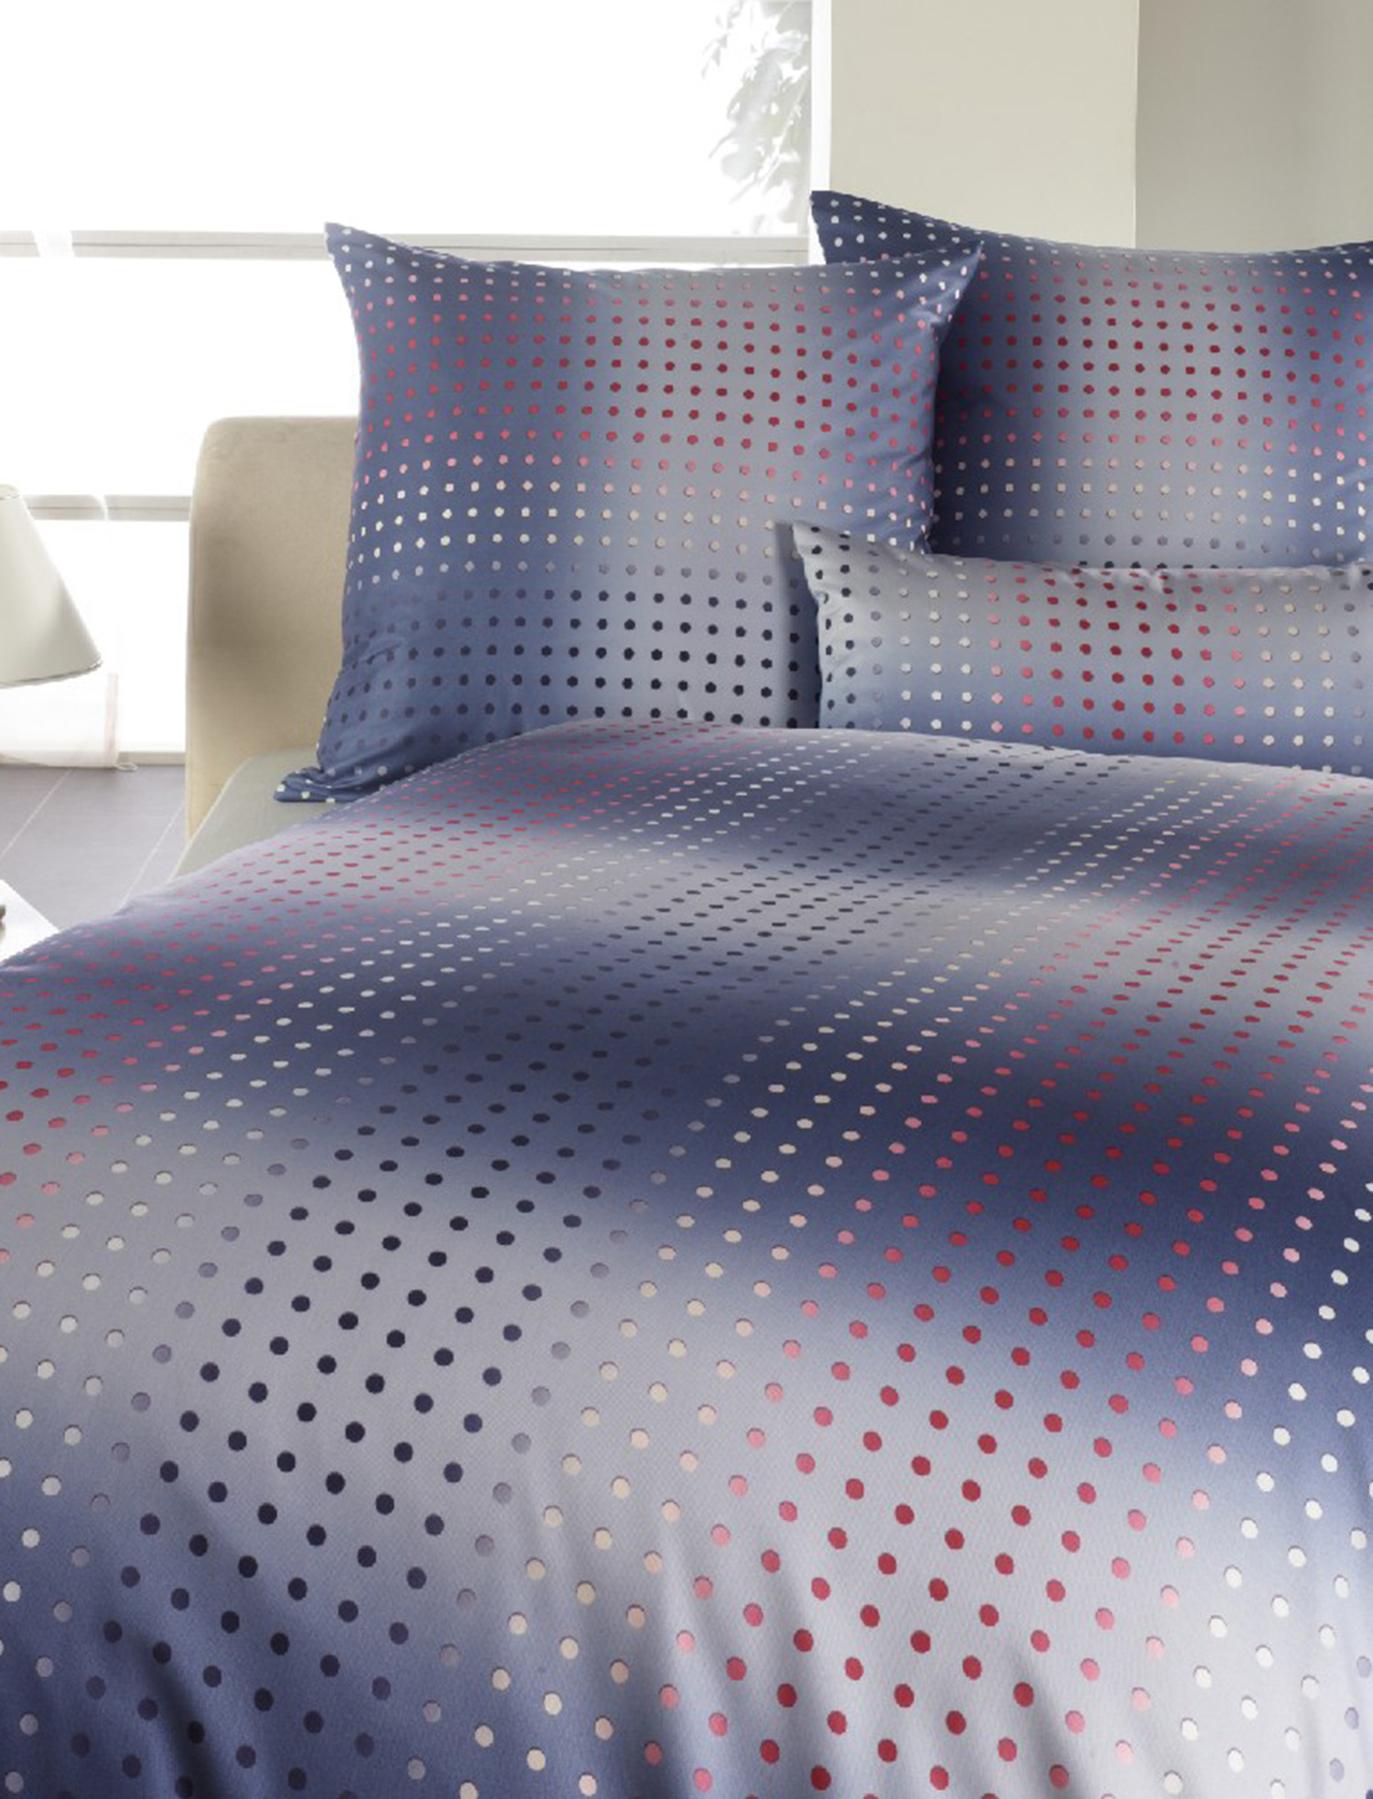 curt bauer mako jersey bettw sche kissenbez ge dots 135x200 80x80 40x80 cm ebay. Black Bedroom Furniture Sets. Home Design Ideas